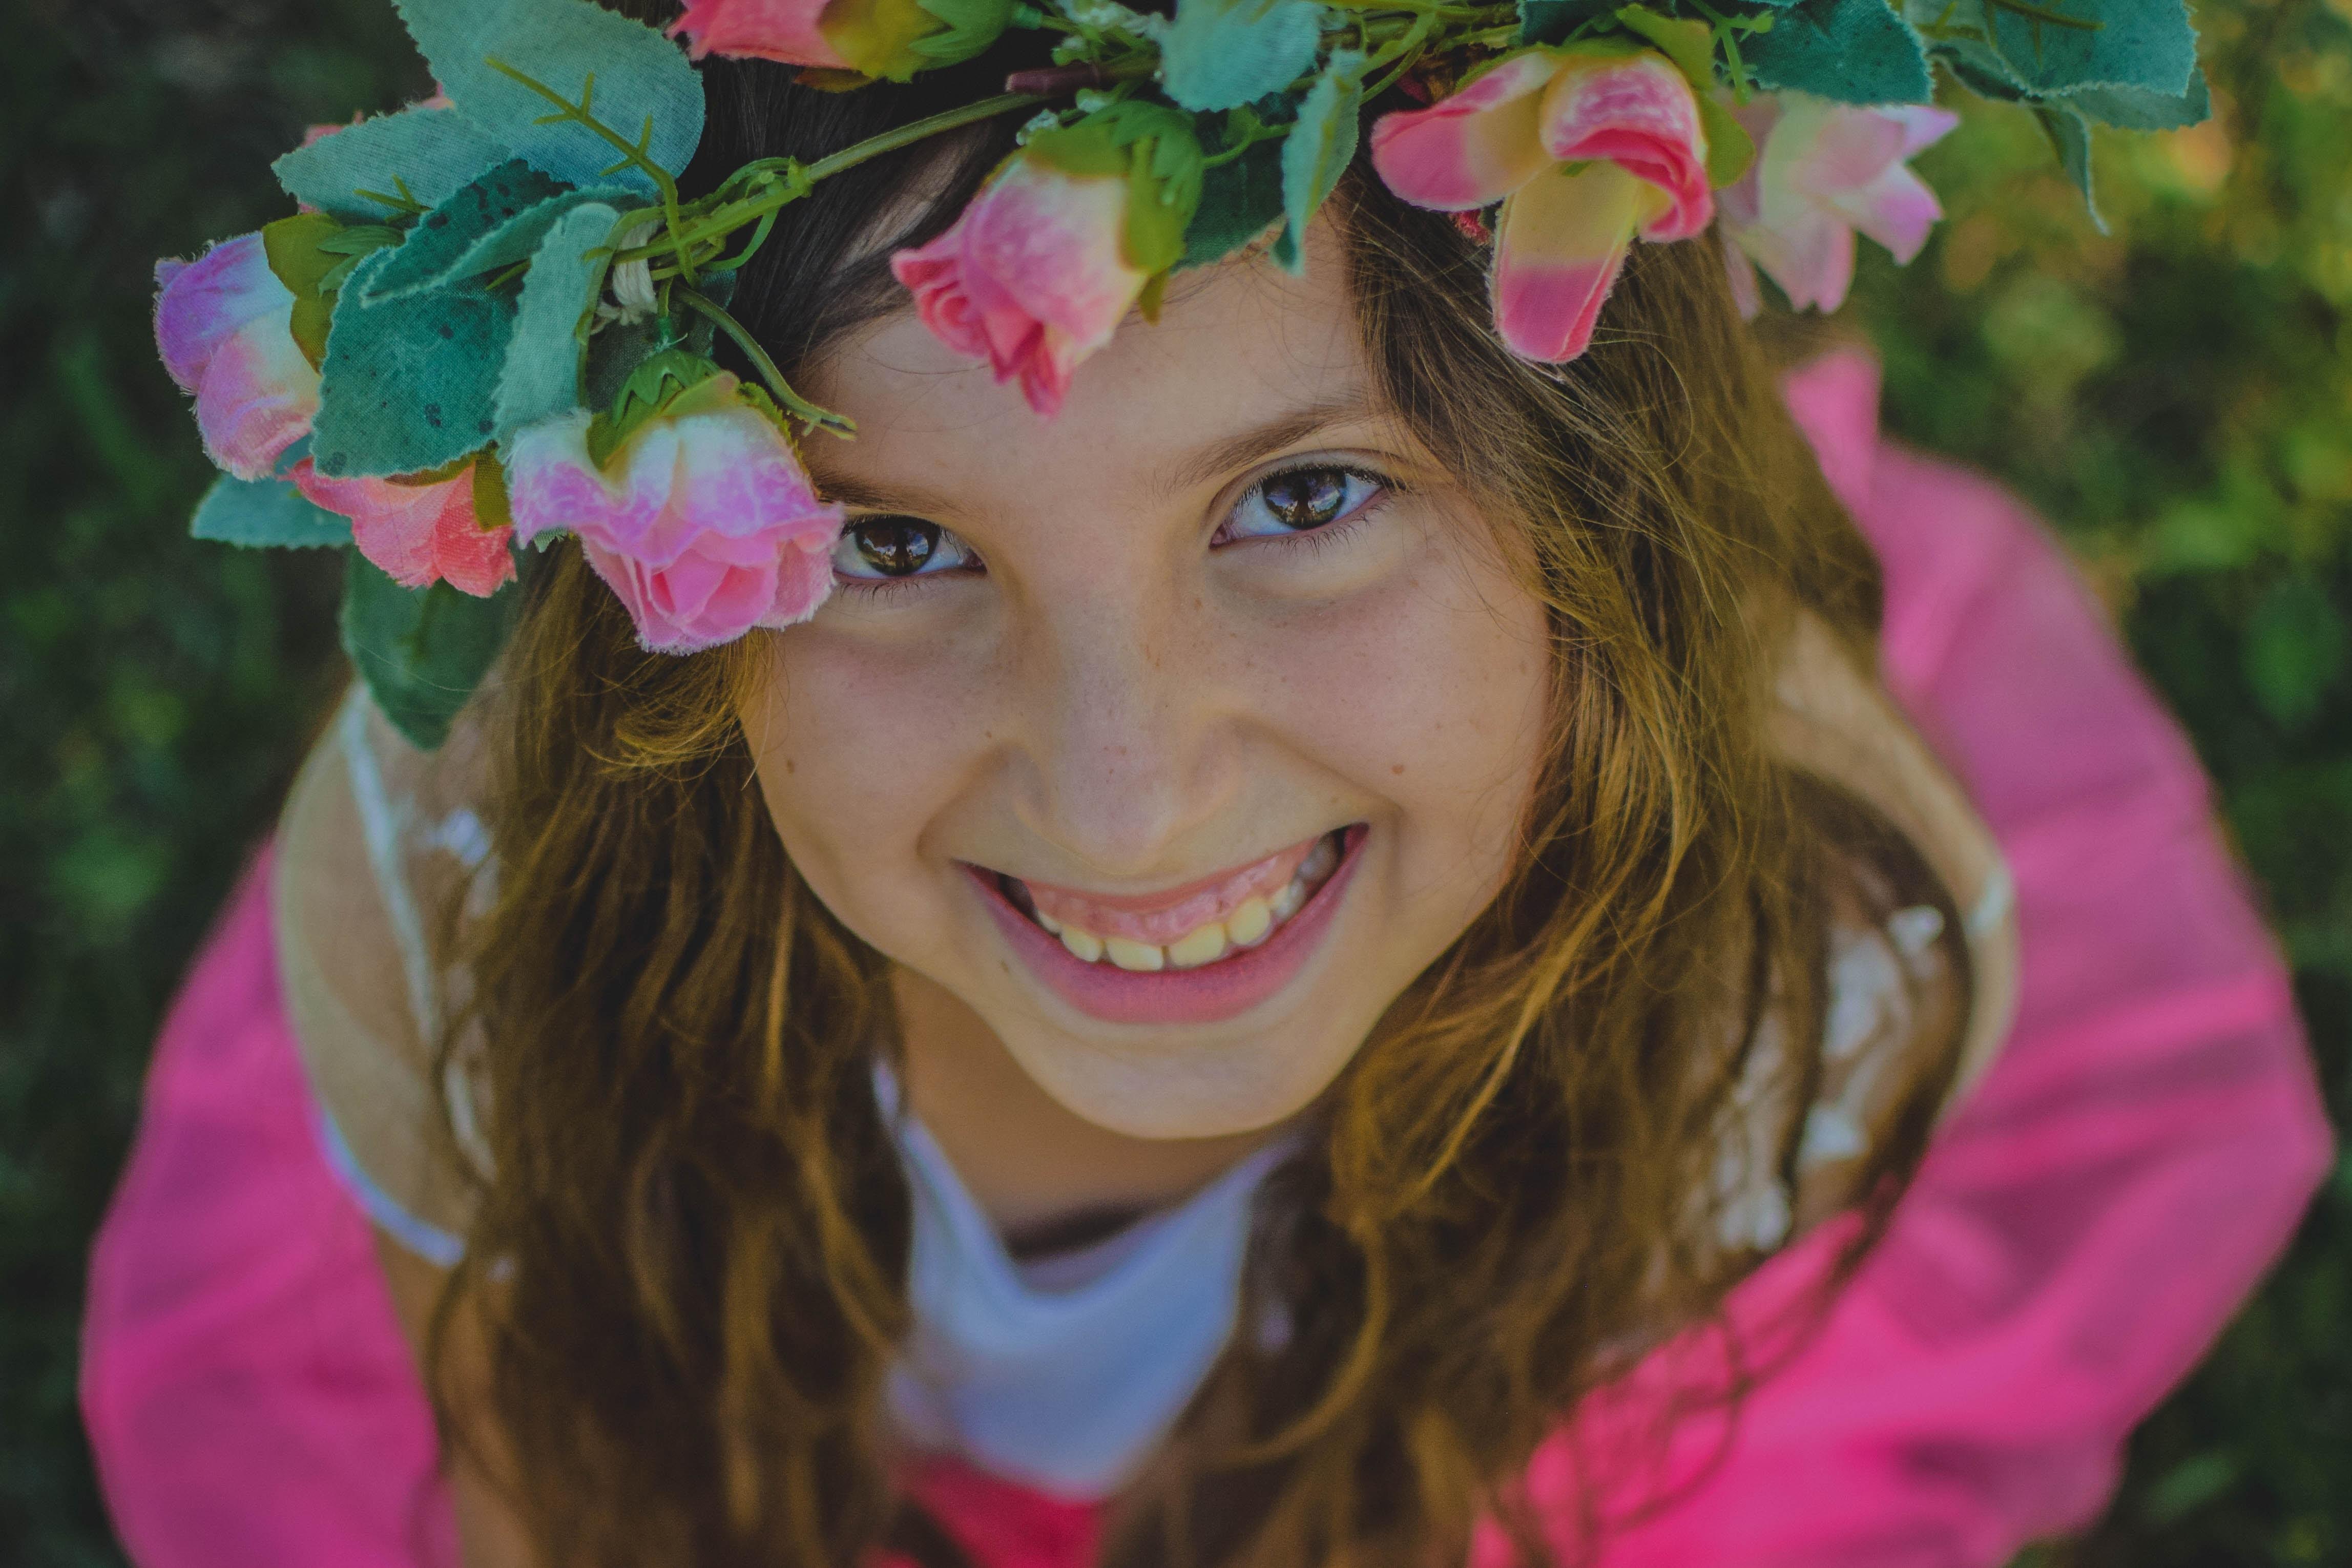 girl wearing flower crown while smiling